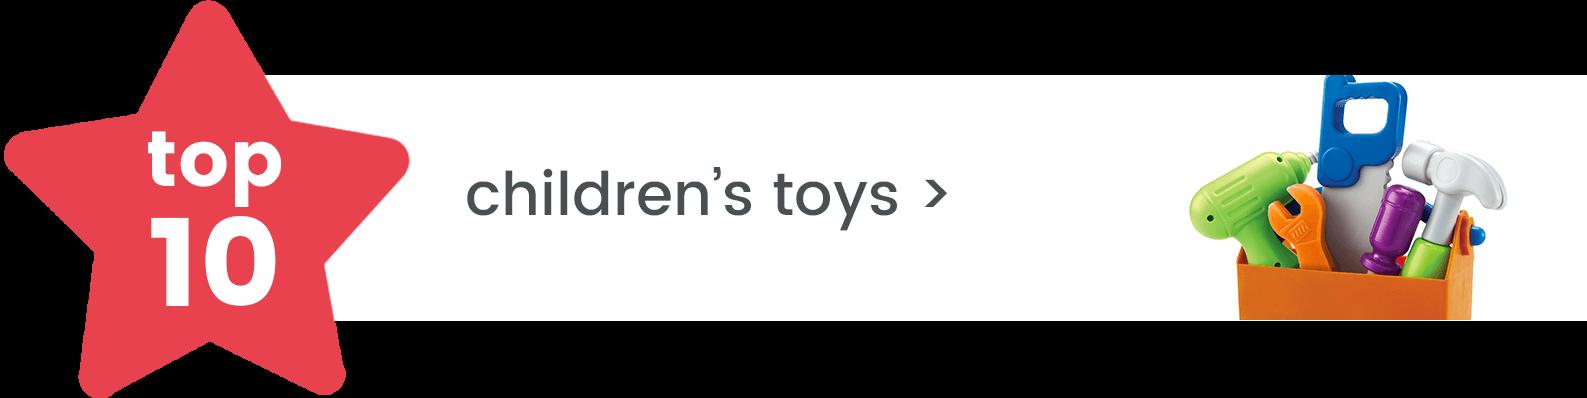 top 10 children's toys